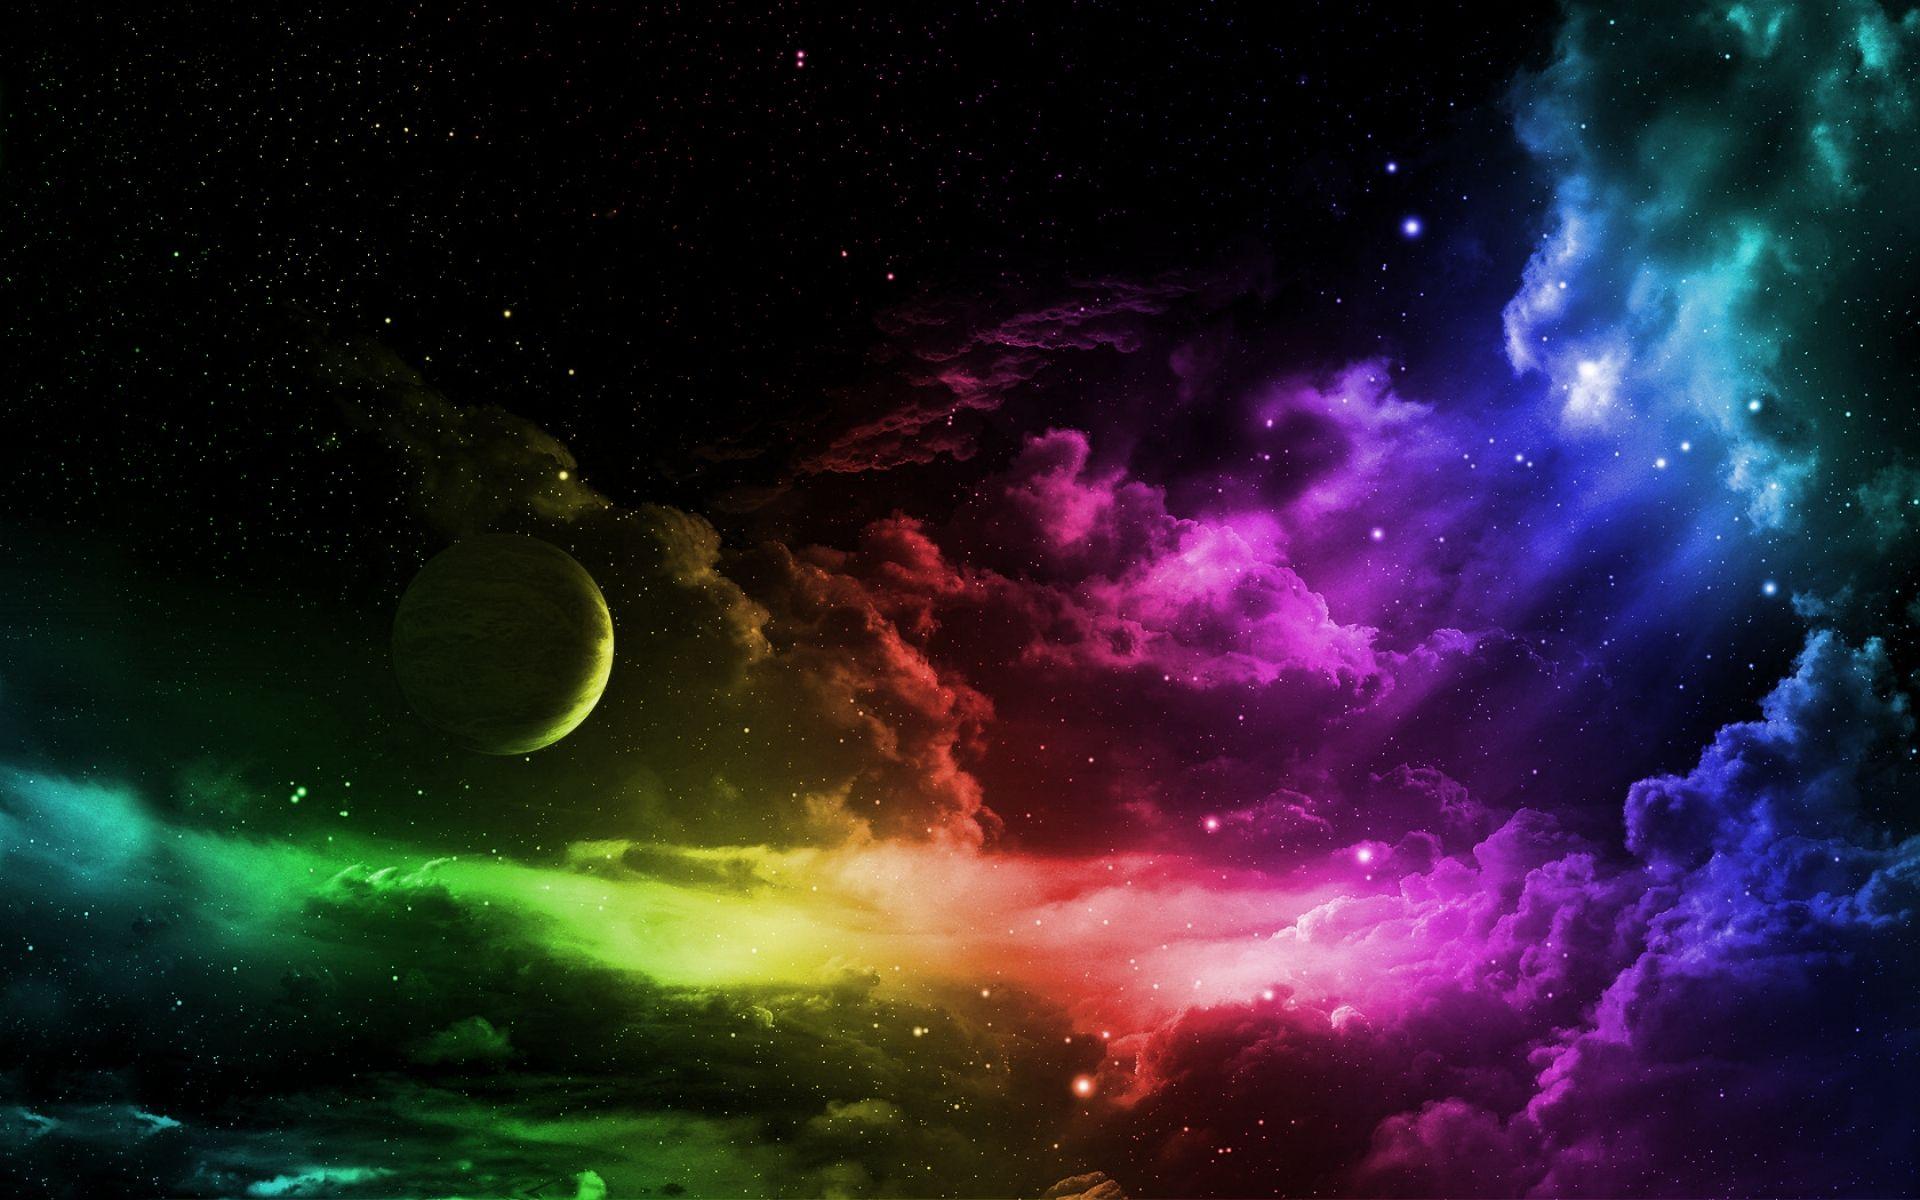 Rainbow dash sky wallpapers colors space wallpaper rainbows images | Photos | Pinterest ...